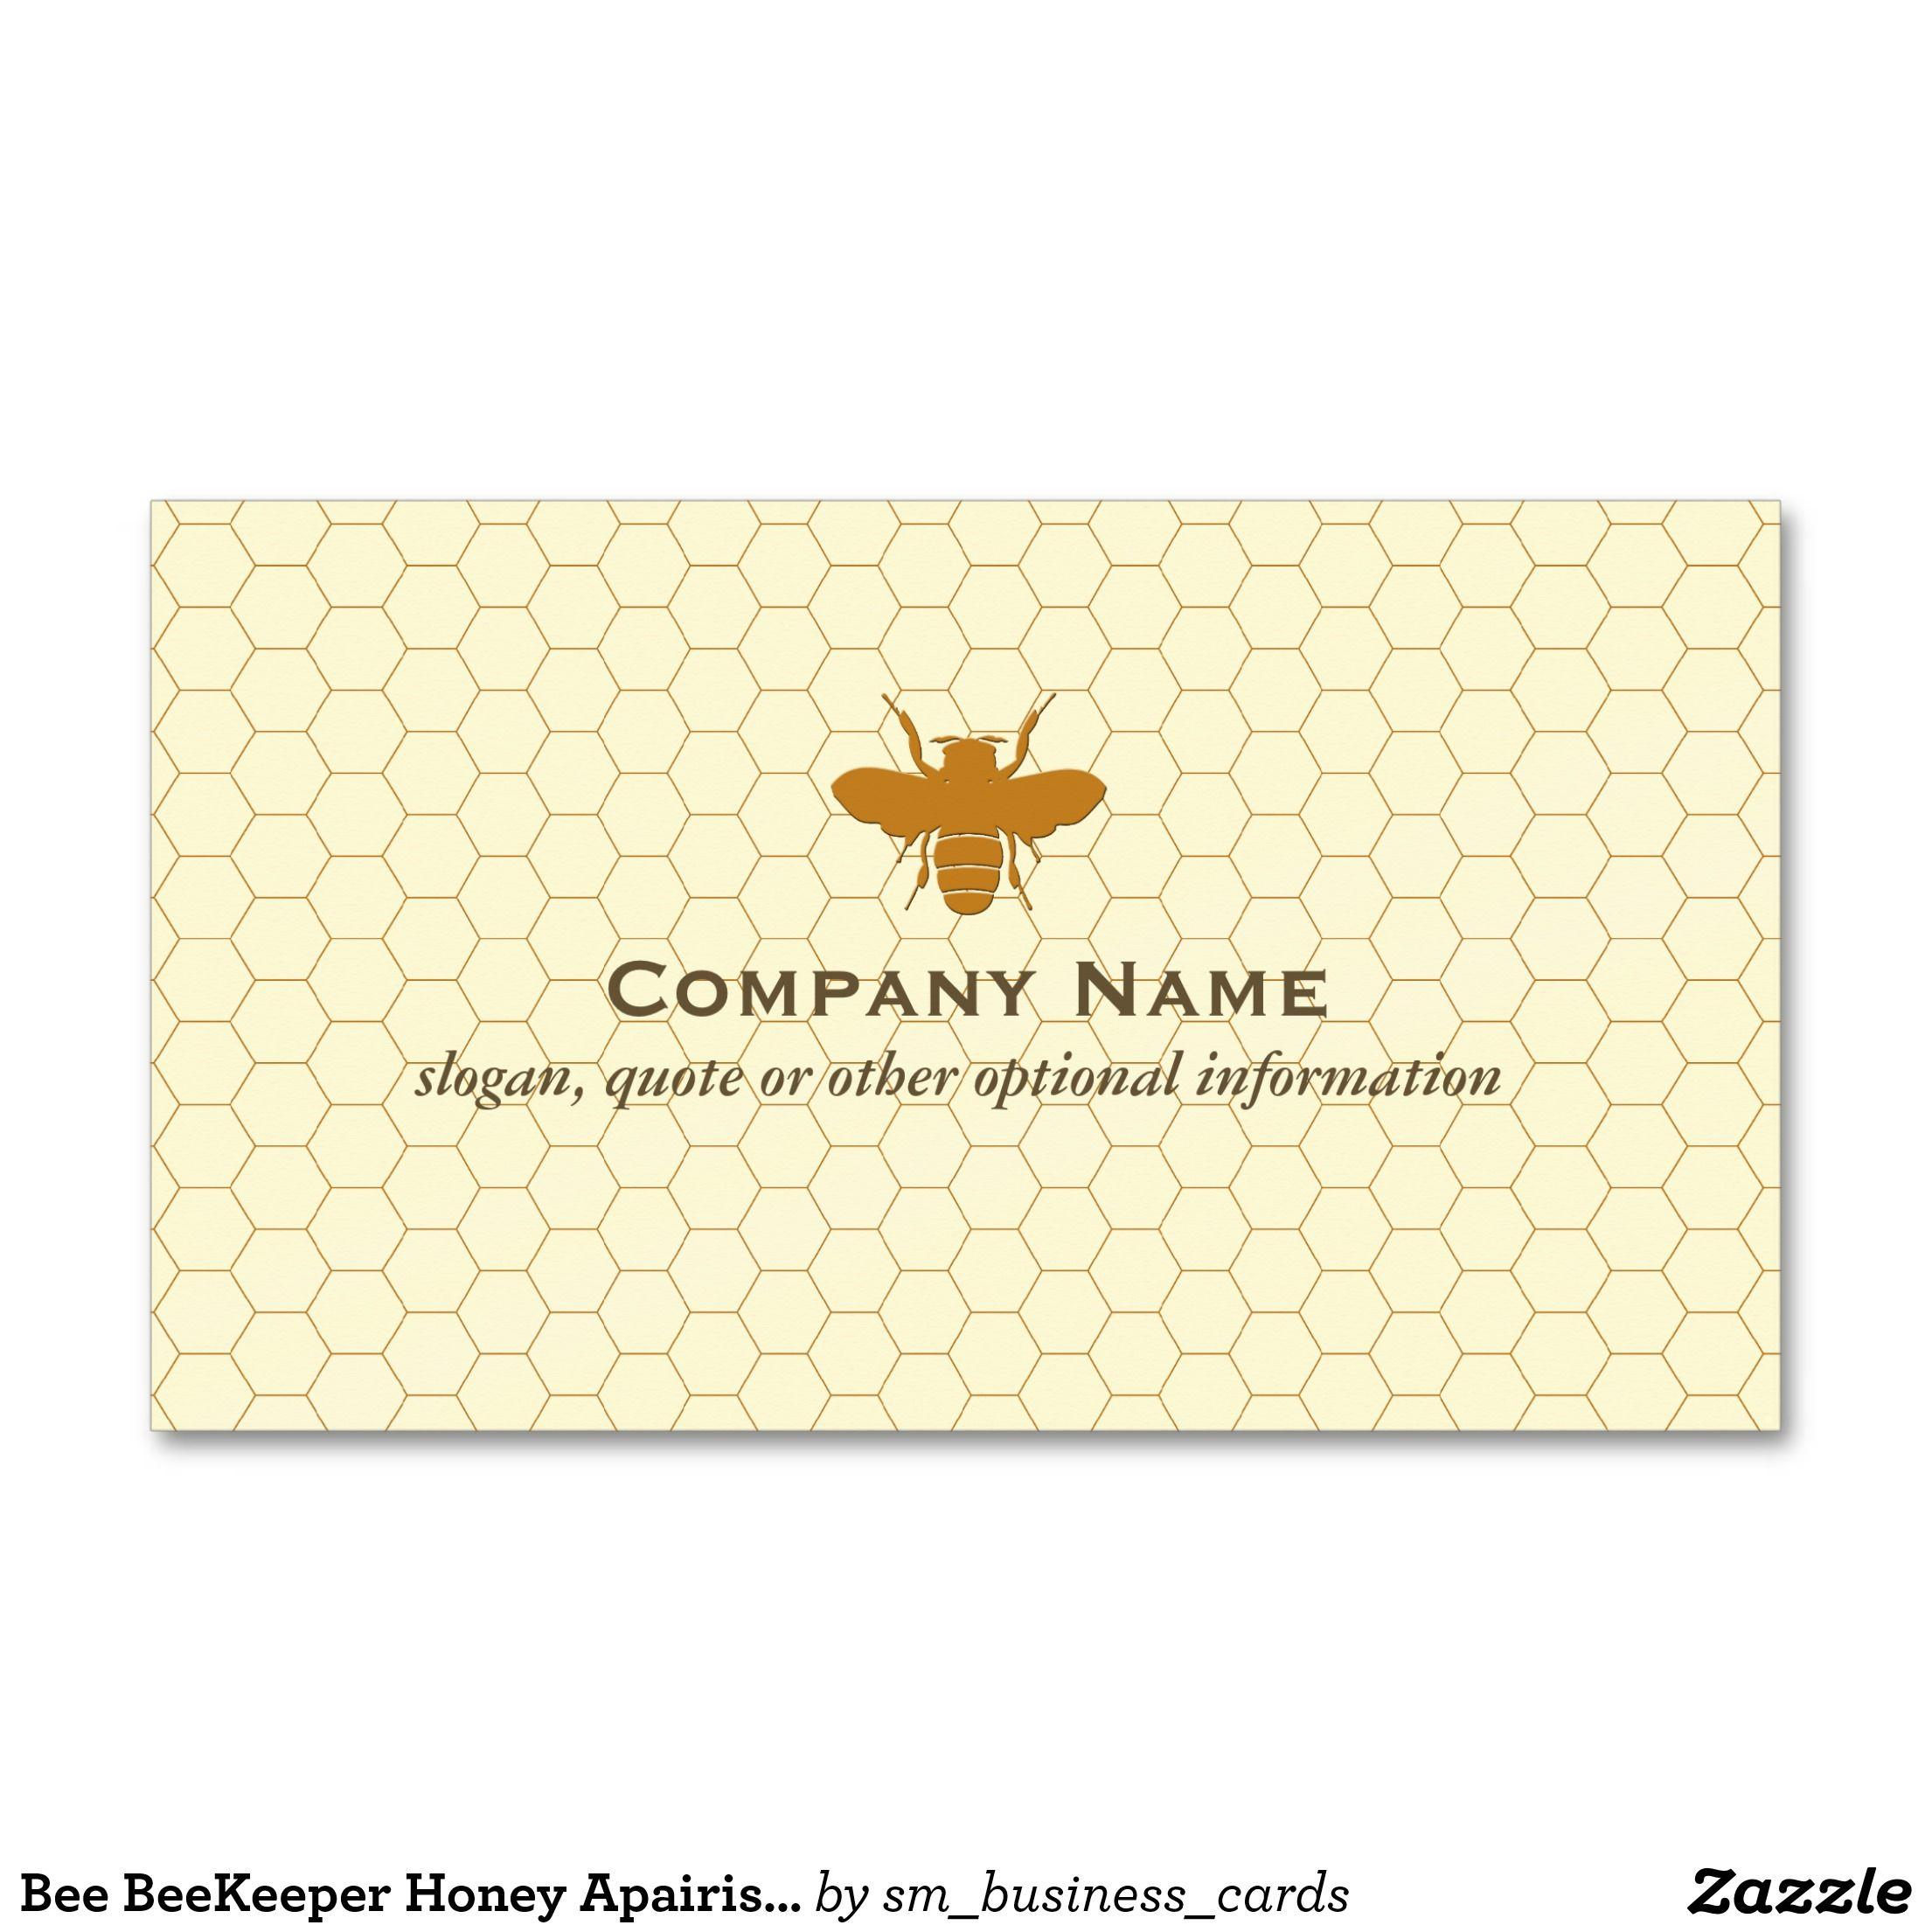 Bee BeeKeeper Honey Apairist Business Card | Pinterest | Business ...